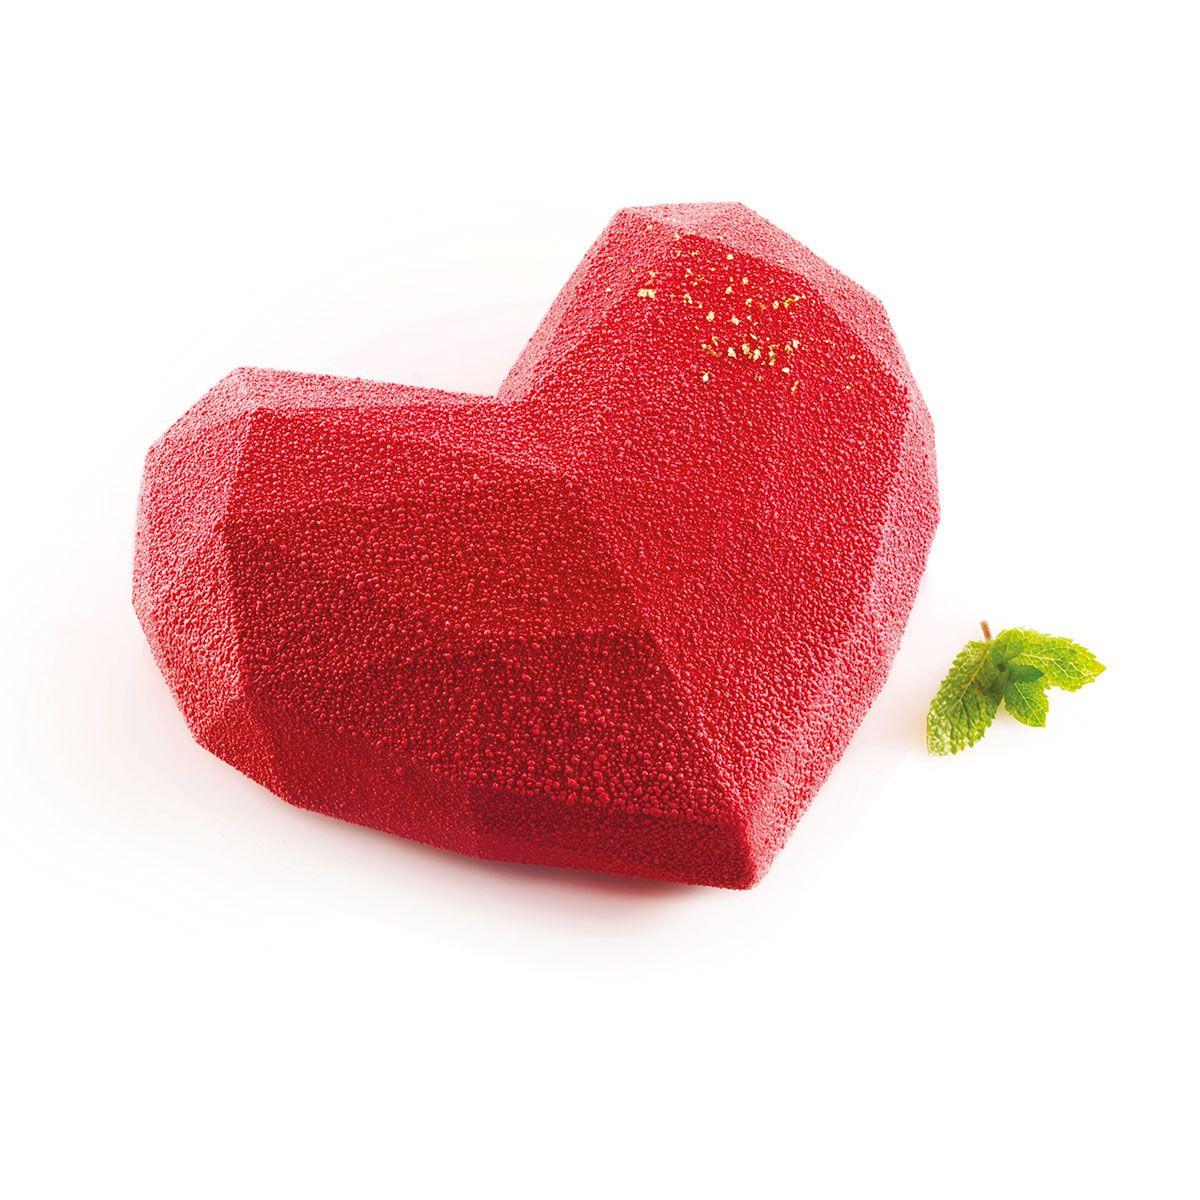 Silikomart Silikonform Amore Origami | geometrisches Herz